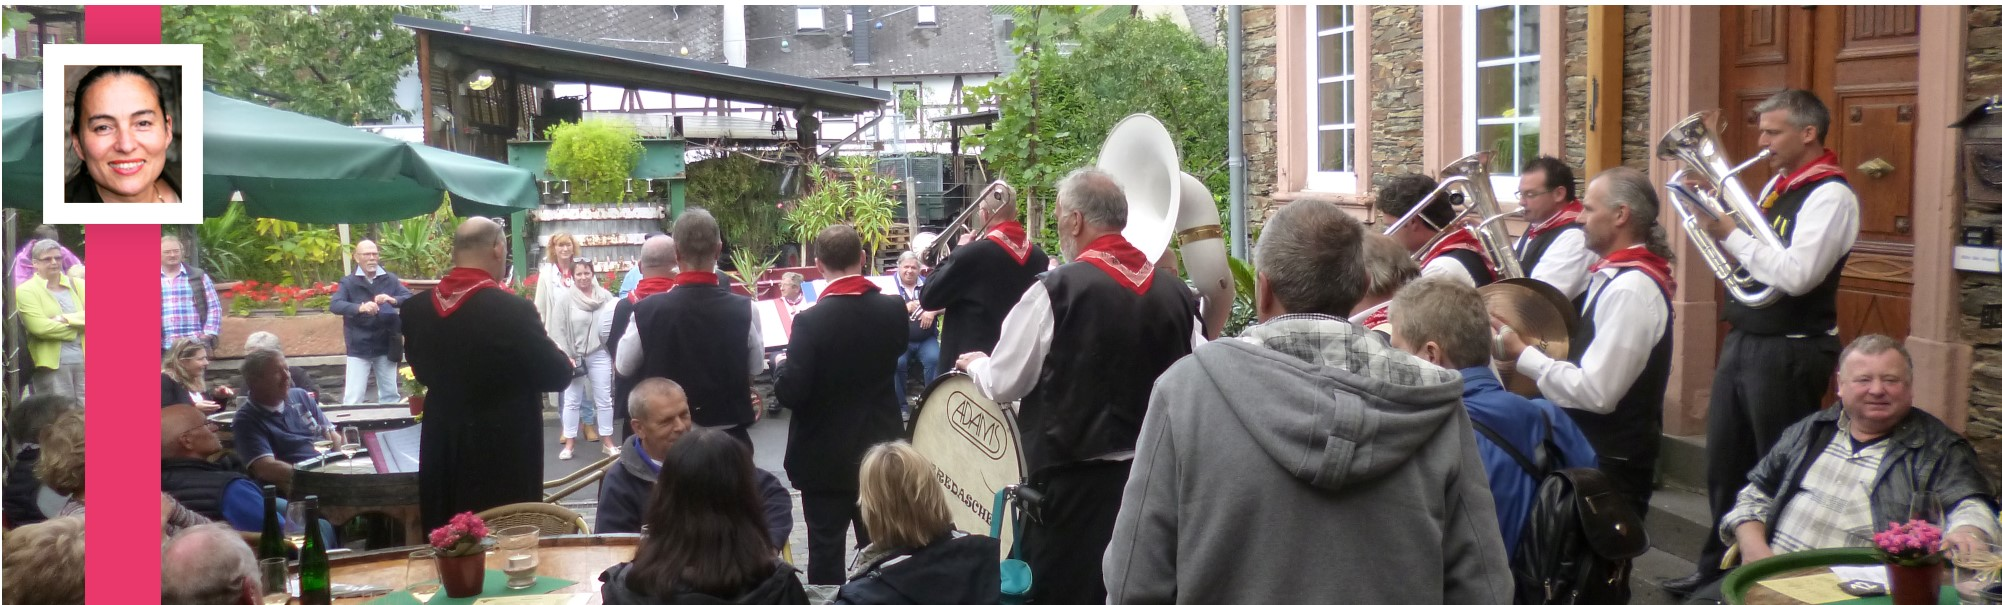 Straßenfest Wolf Mosel Traben-Trarbach